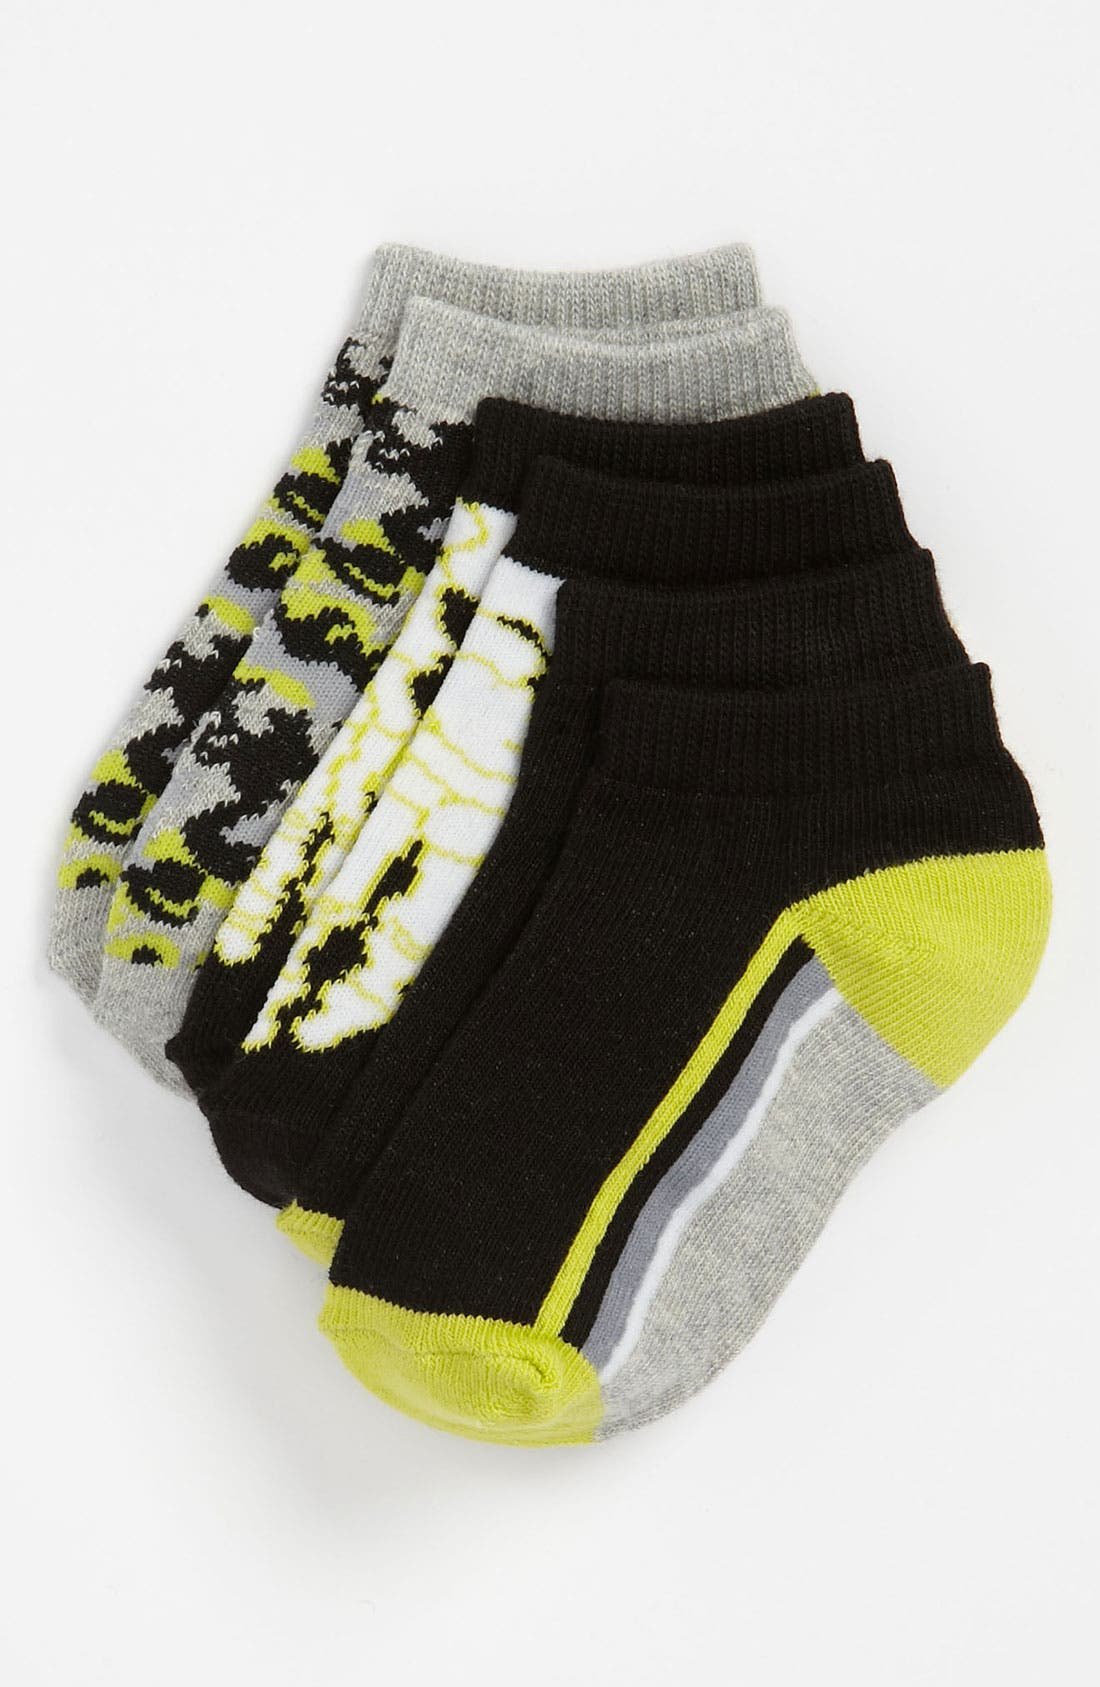 Main Image - Nordstrom 'Crossbones' Socks (3-Pack) (Toddler, Little Boys & Big Boys)